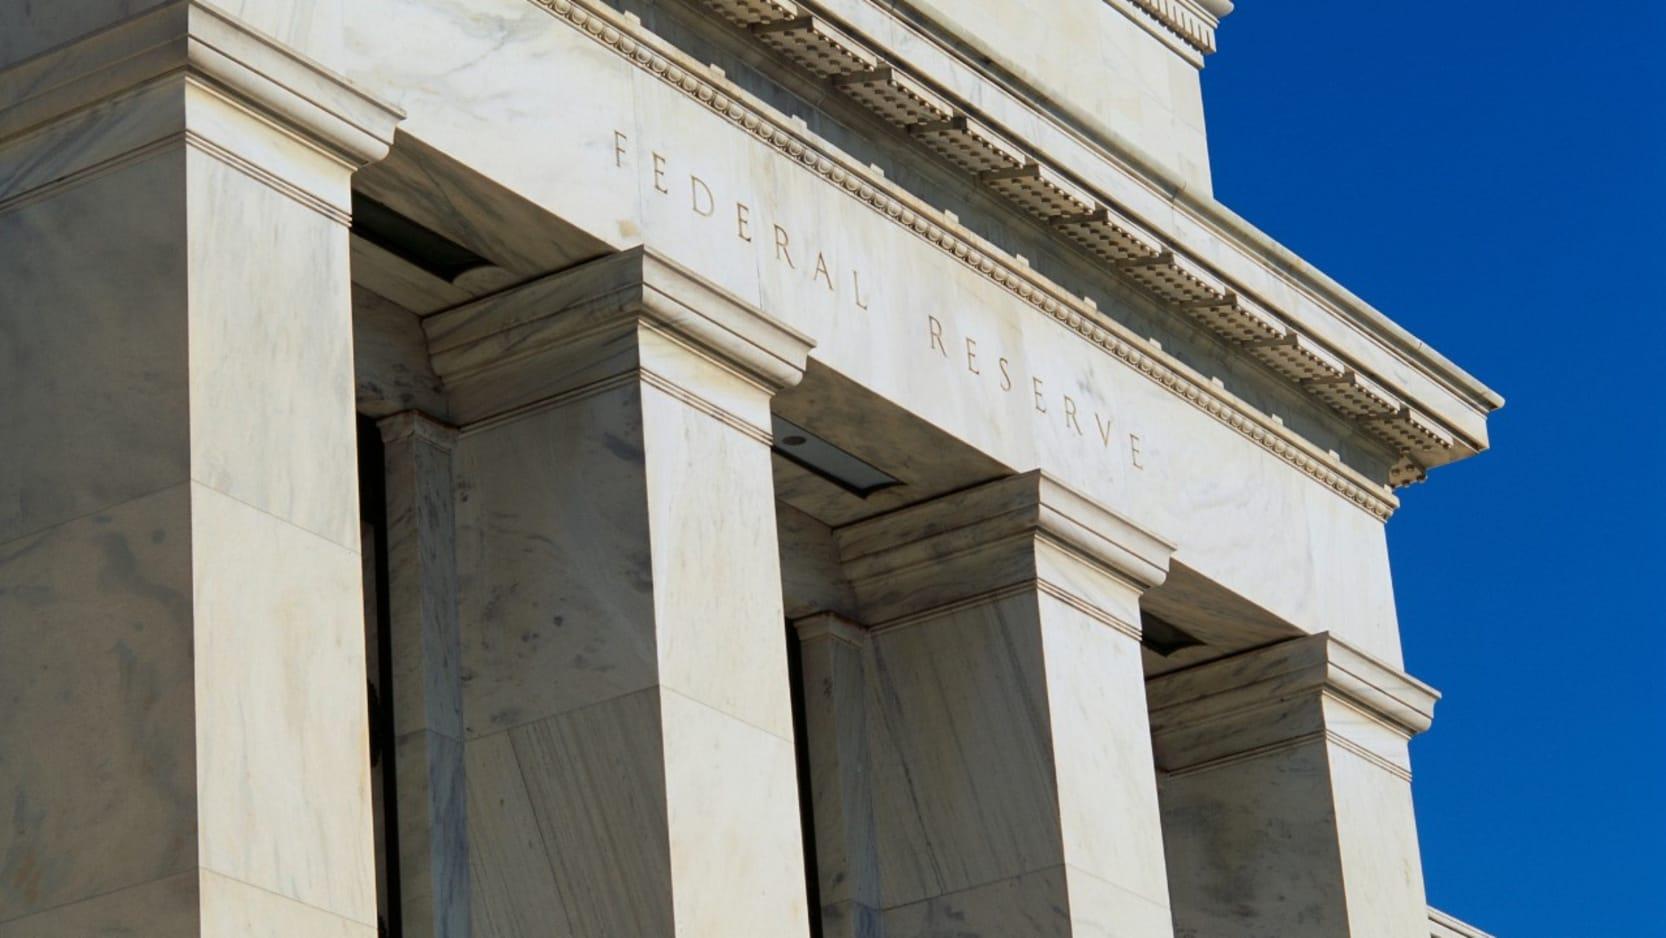 Federal-Reserve_getty.jpg